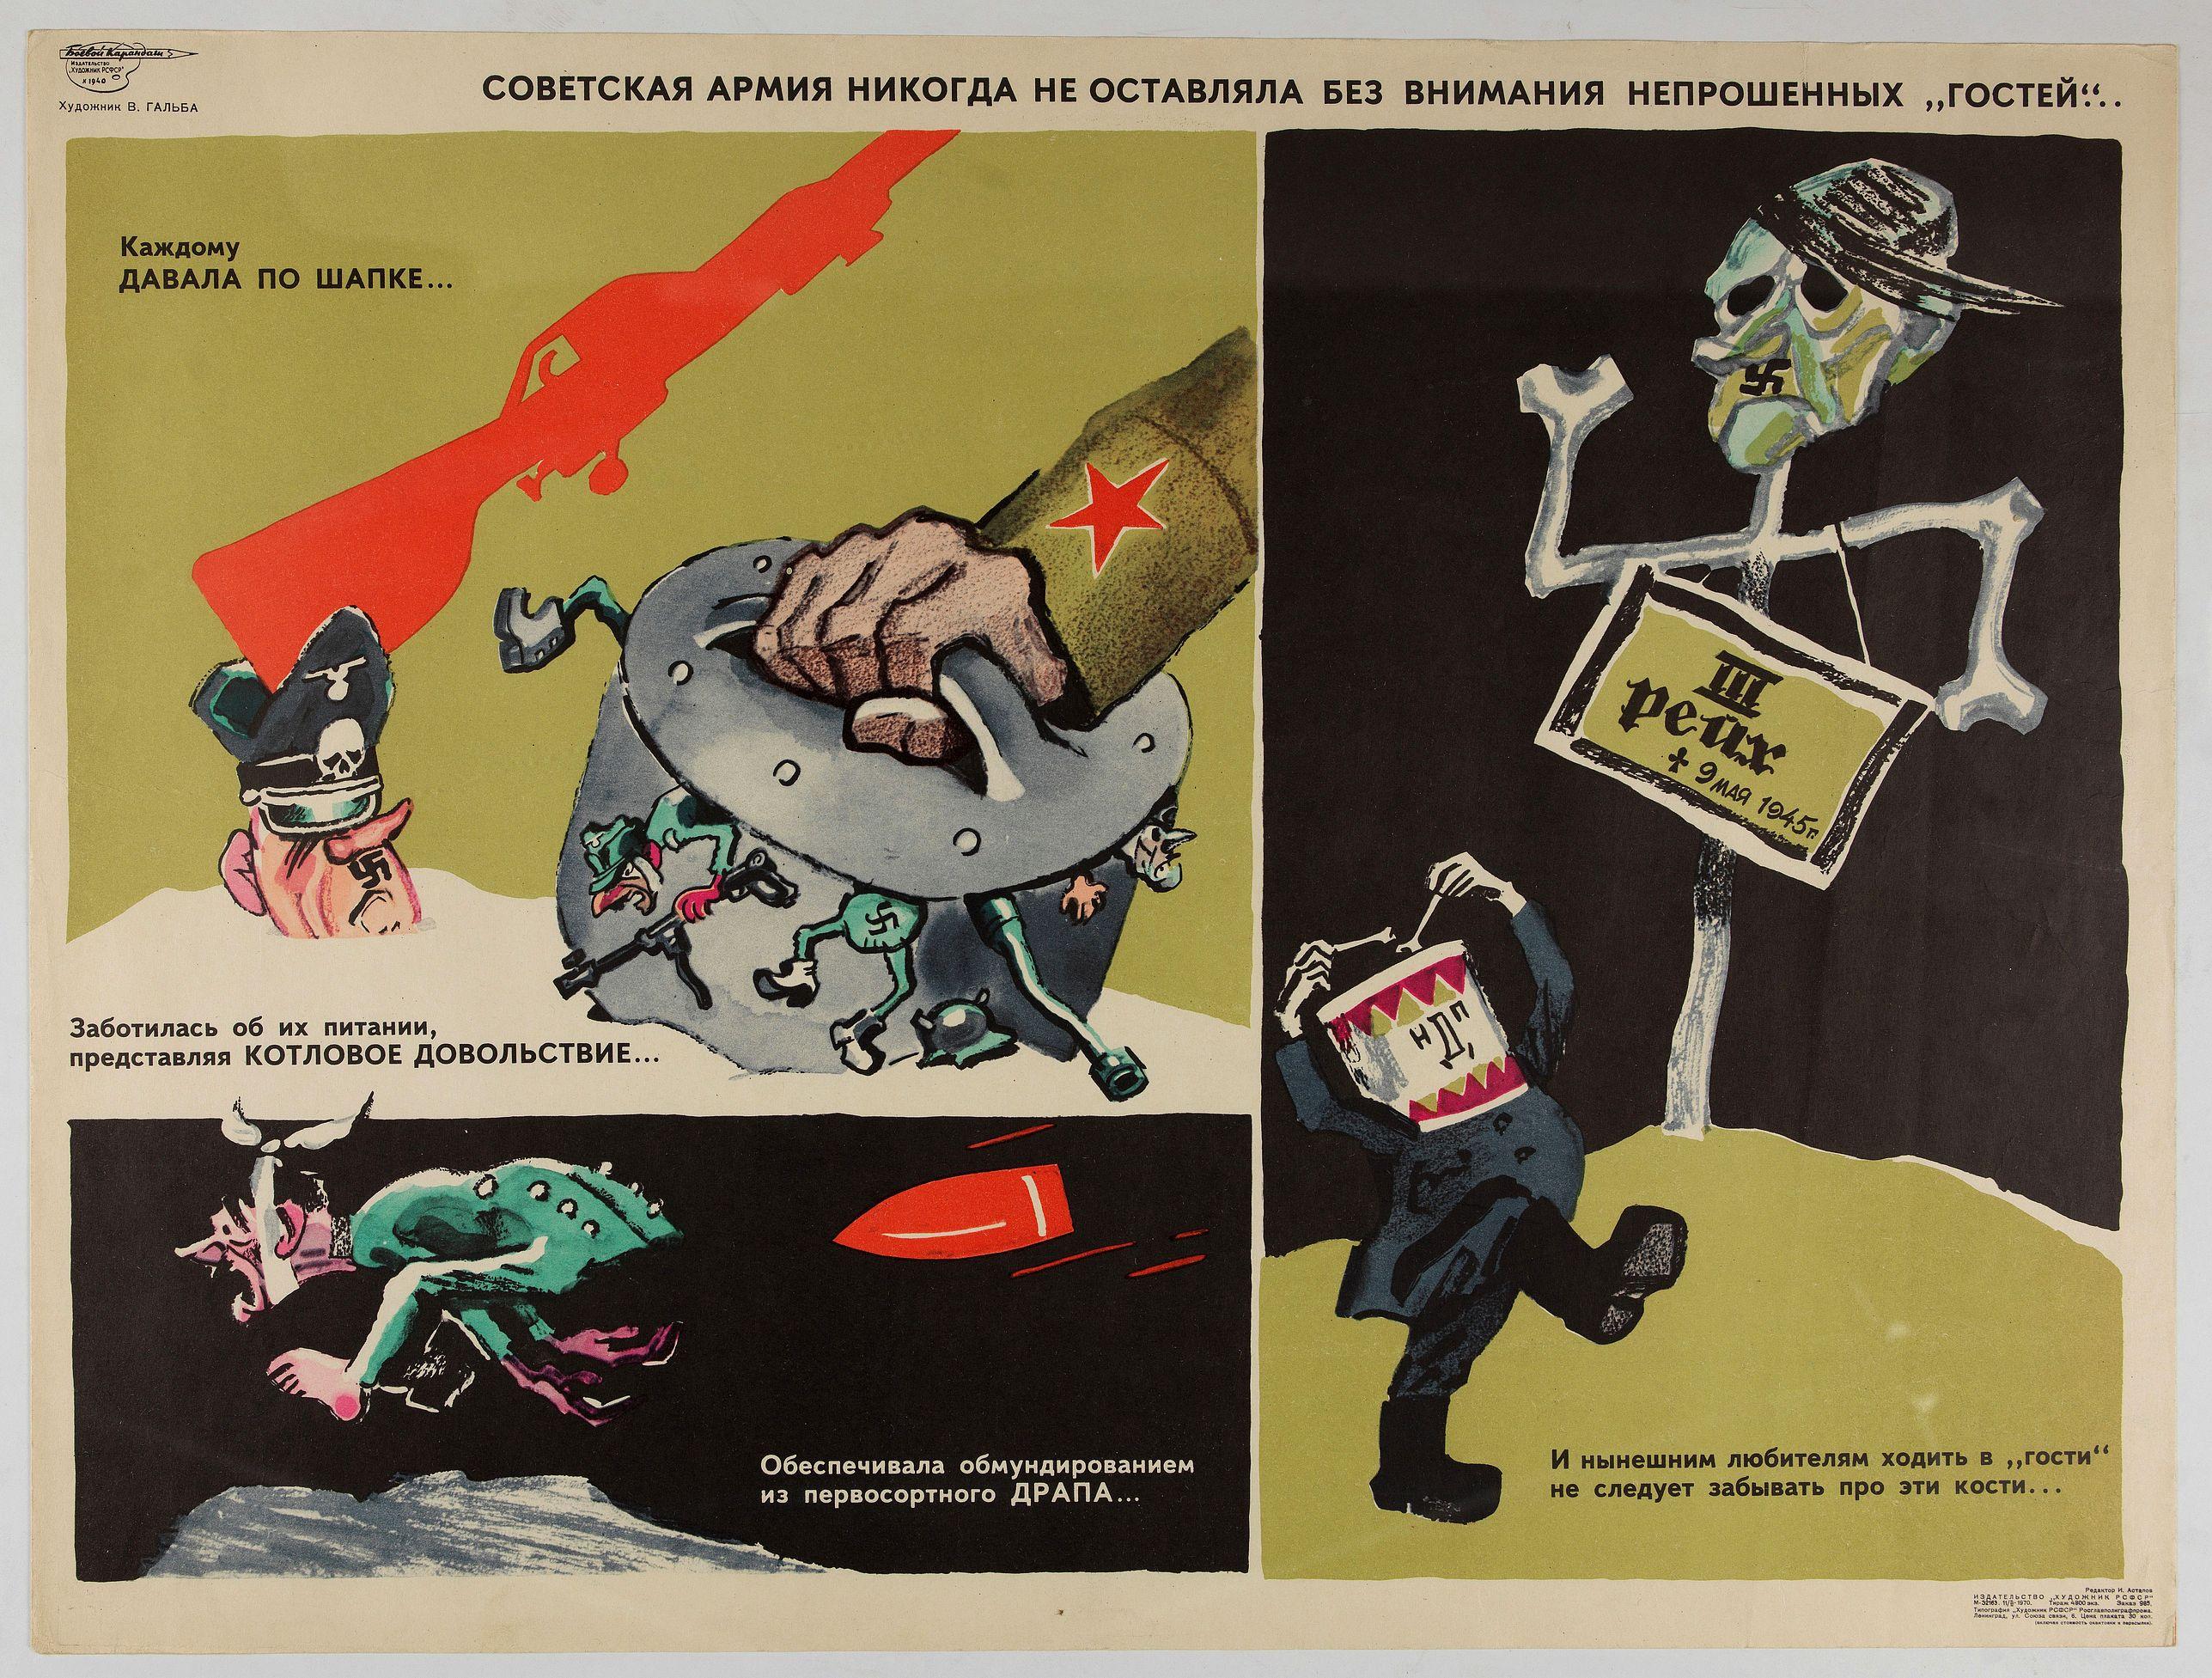 THE FIGHTING PENCILS -  [Anti capitalism Soviet Union propaganda poster]